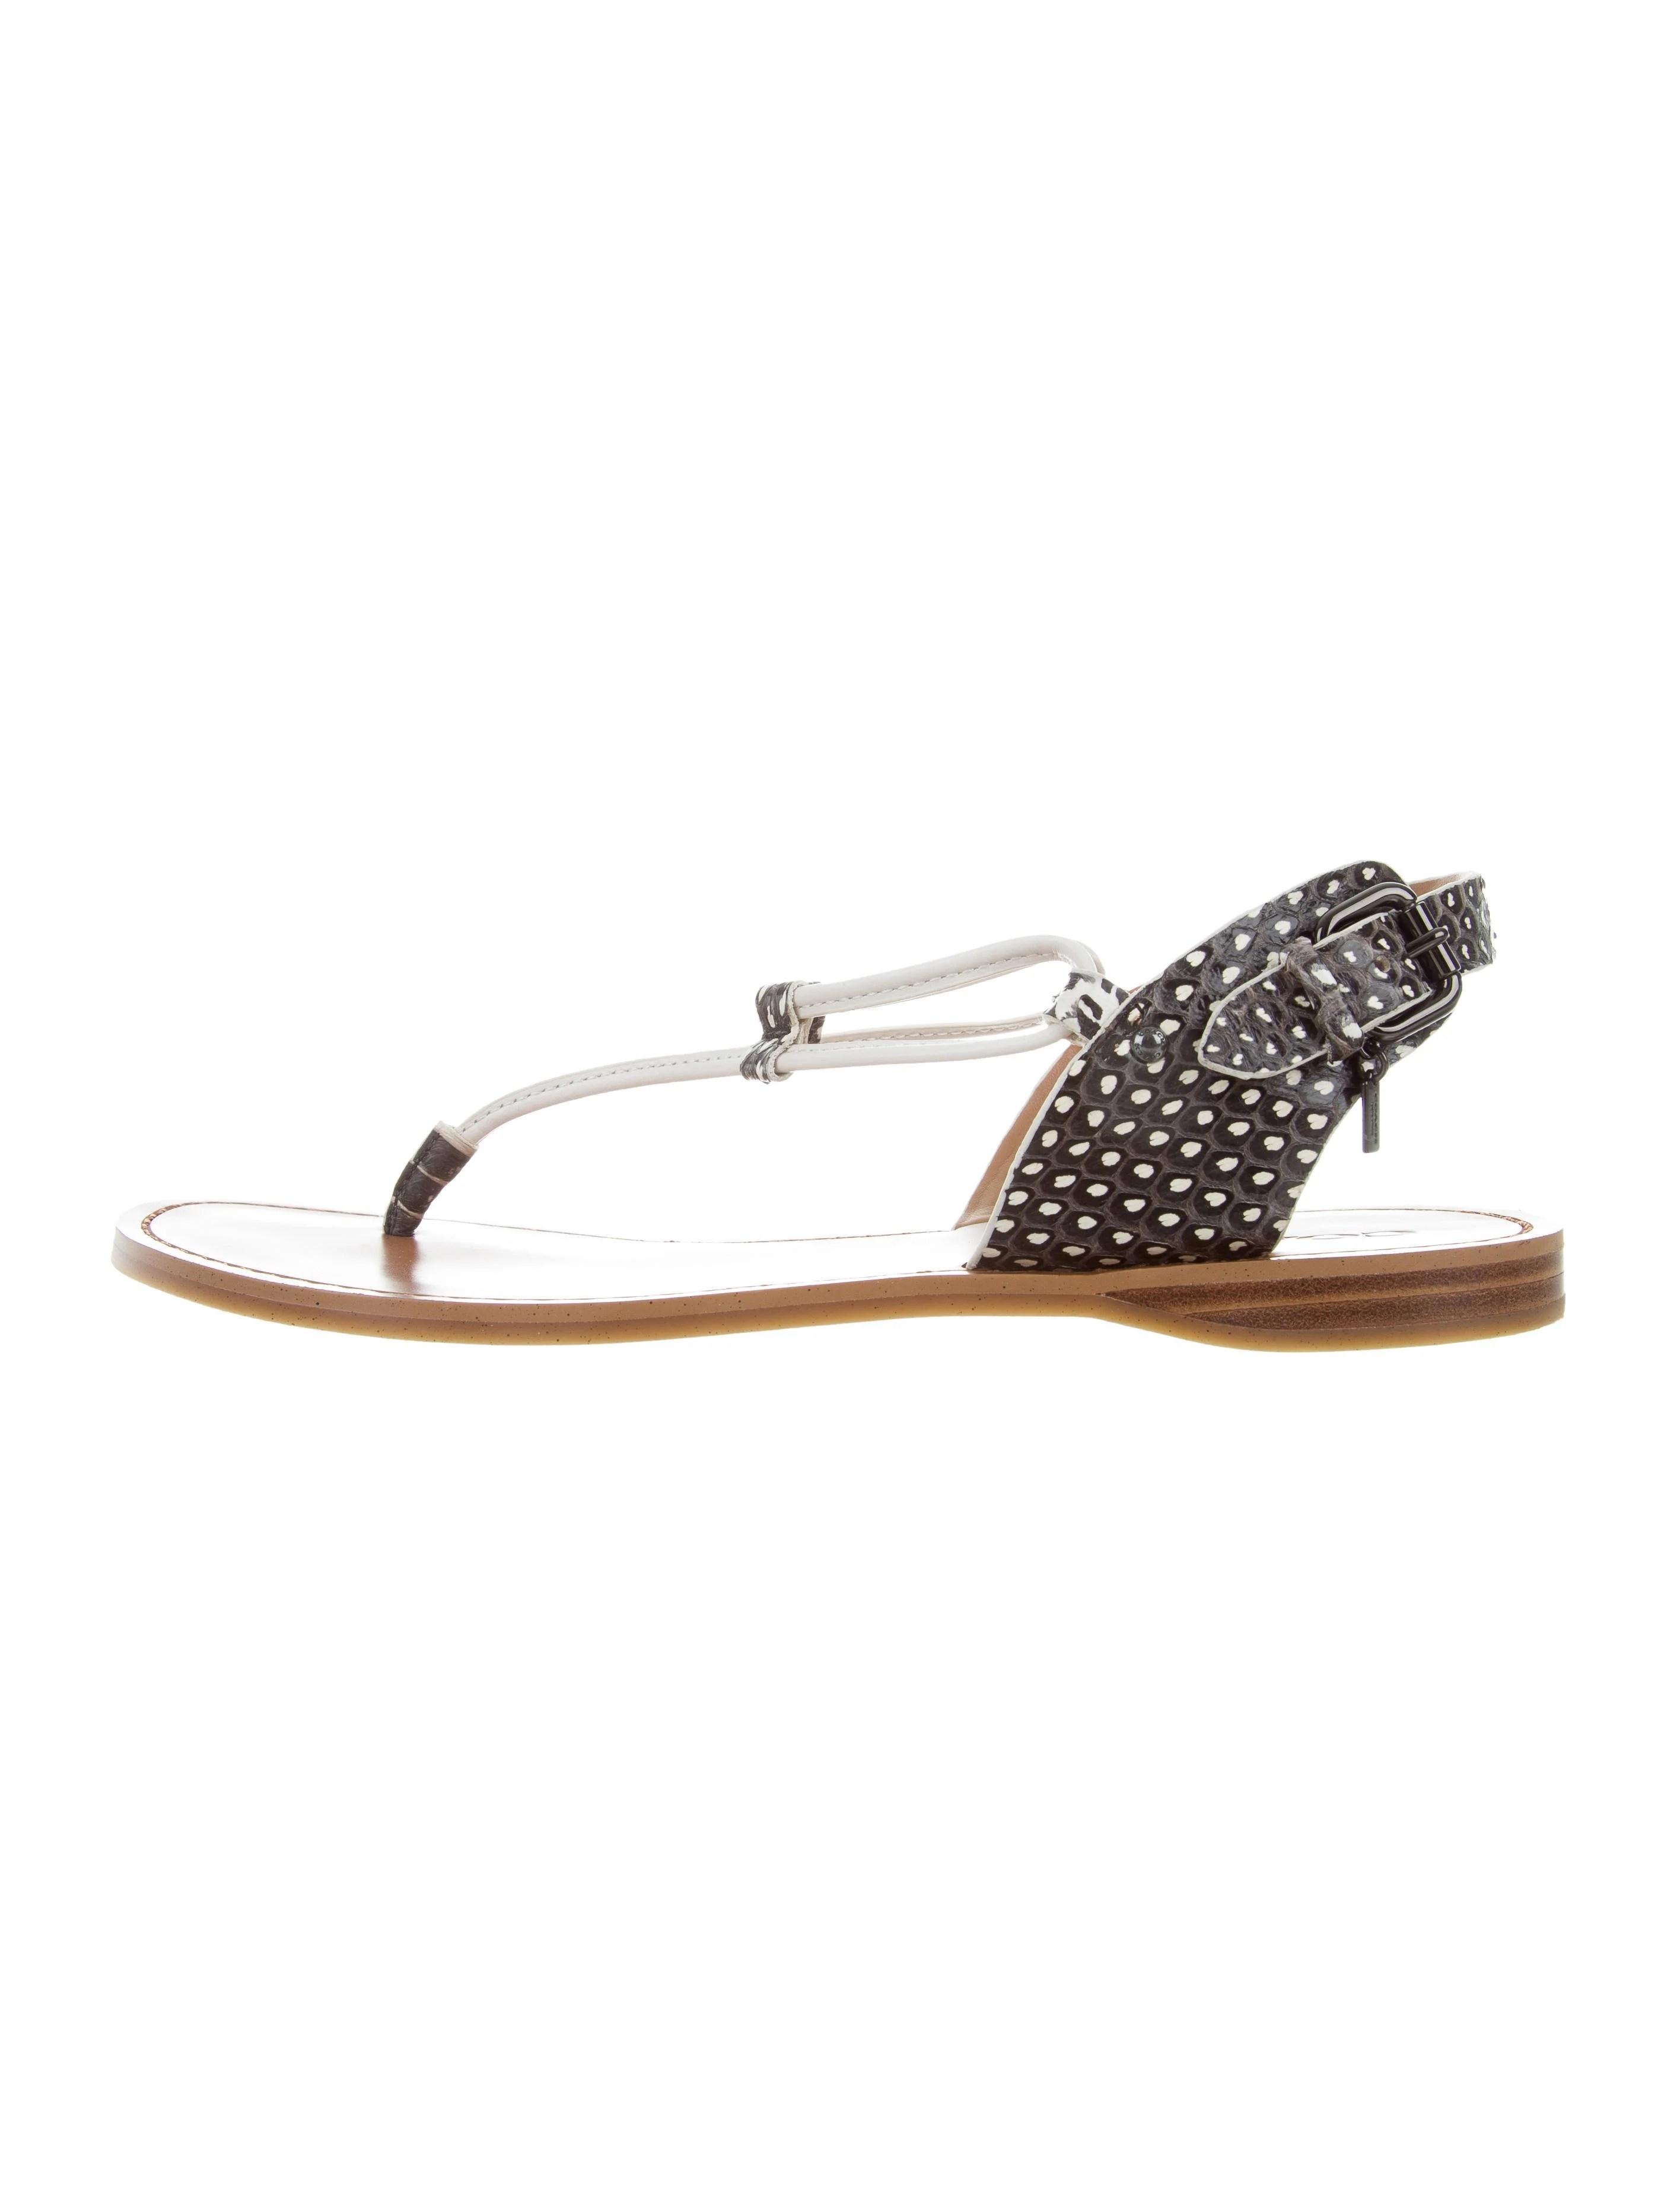 Coach Snakeskin Thong Sandals